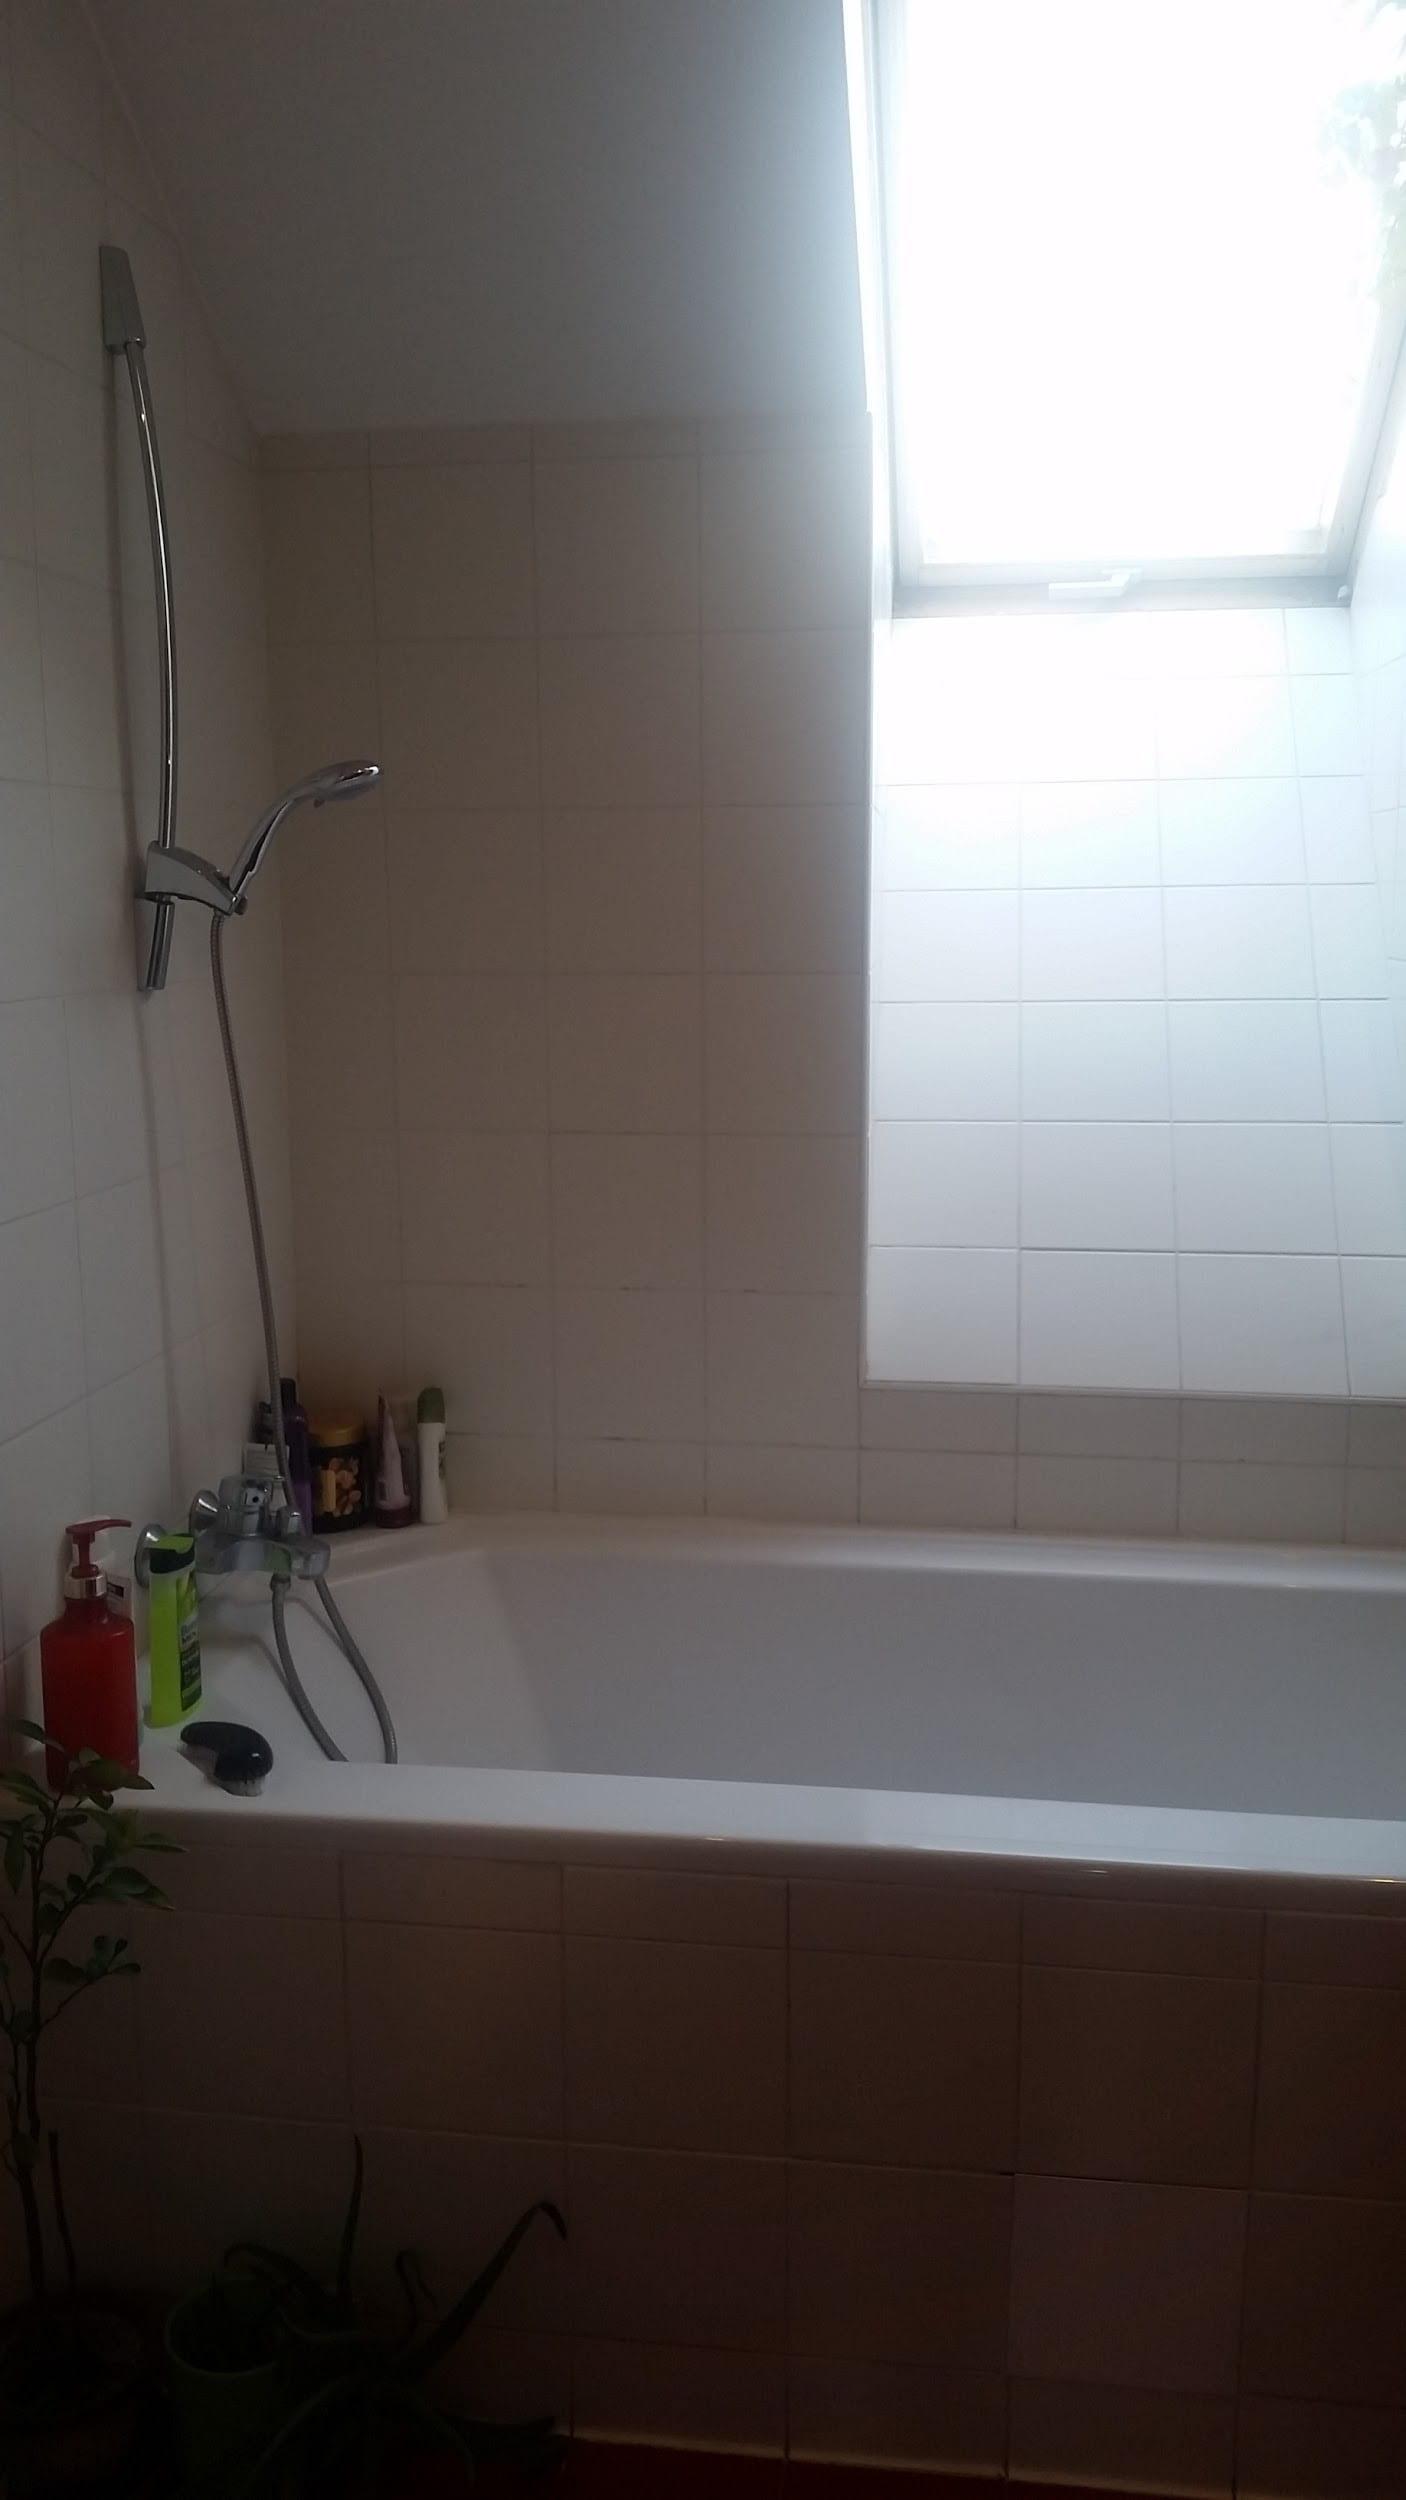 Bathtub with shower head in Czech Republic